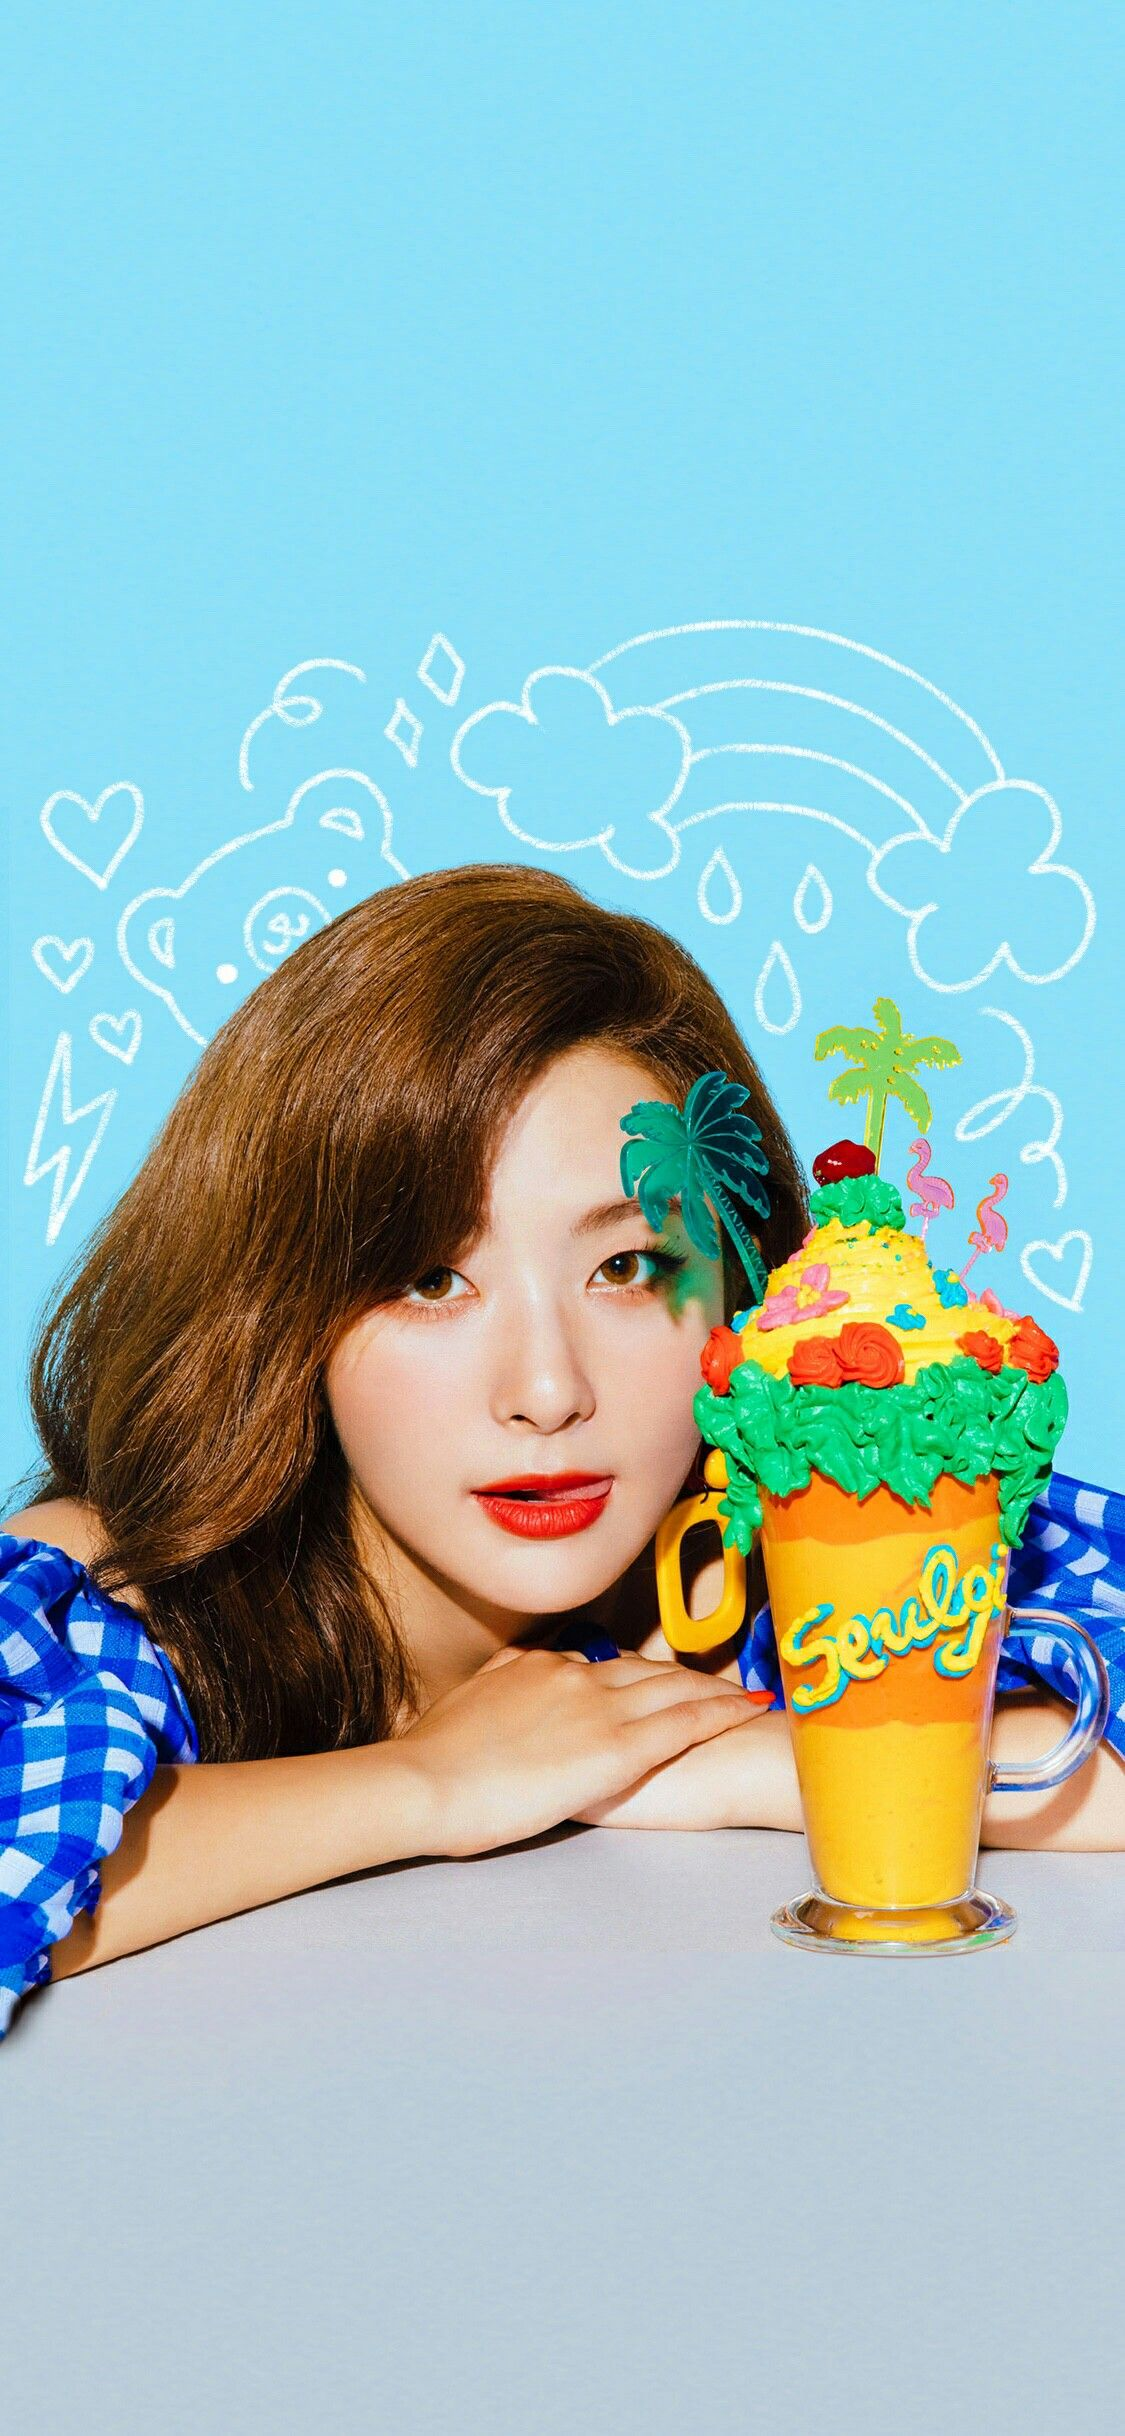 Red Velvet Seulgi Irene Wendy Yeri Joy Wallpaper Lockscreen Hd Fondo De Pantalla Iphone Power Up Latar Belakang Kpop